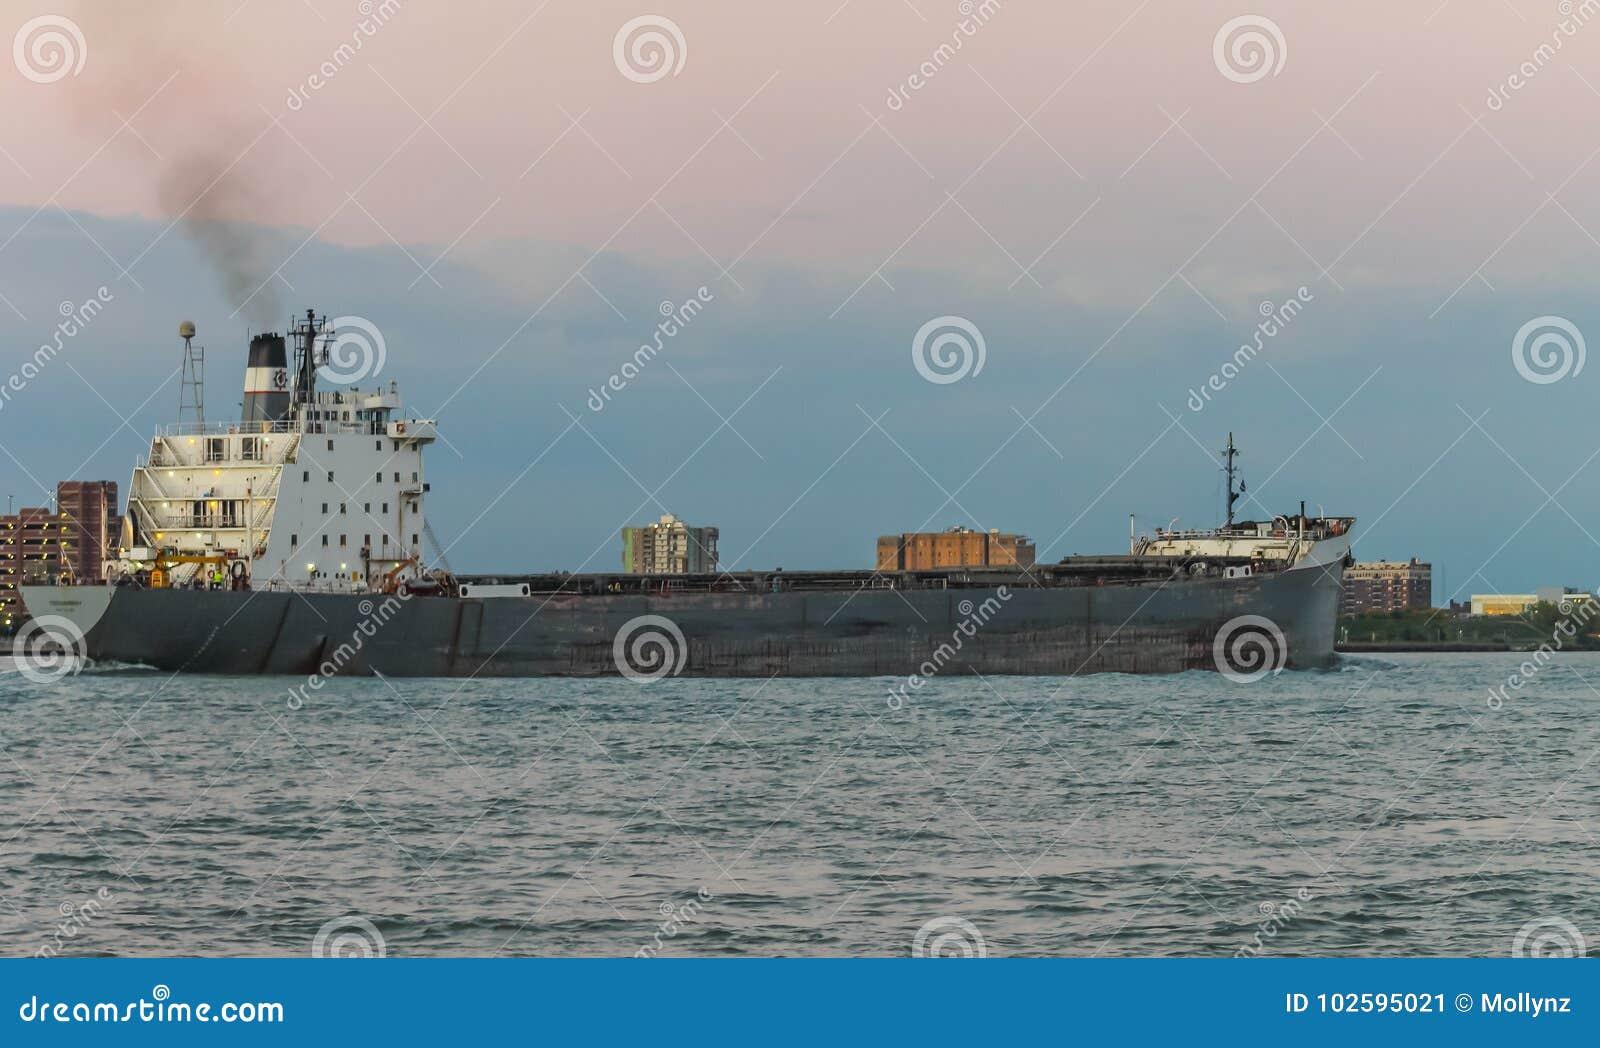 The TECUMSEH Bulk Carrier ship on the Detroit River at dusk